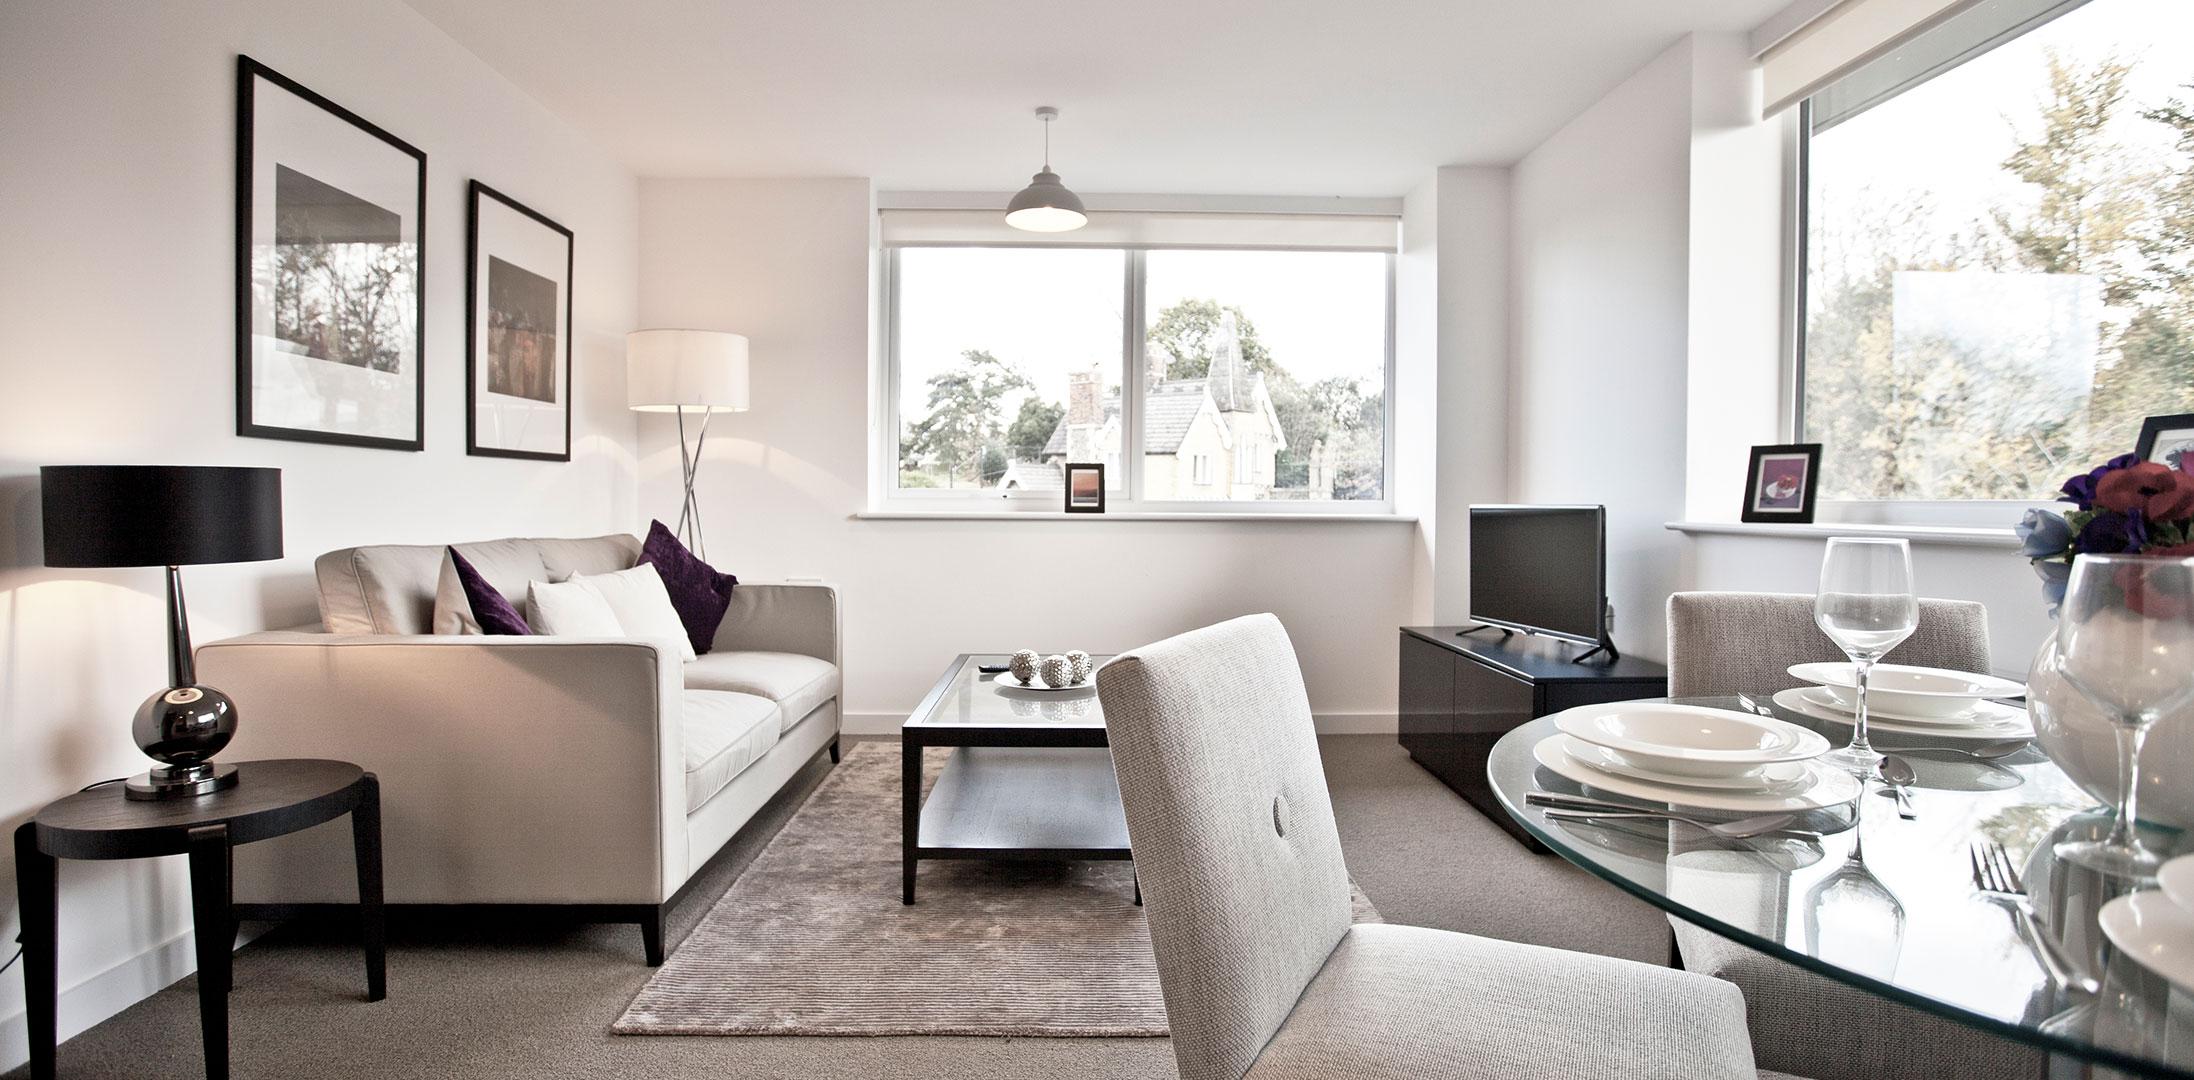 advanced-scaffolding-dexter-court-apartment-interior